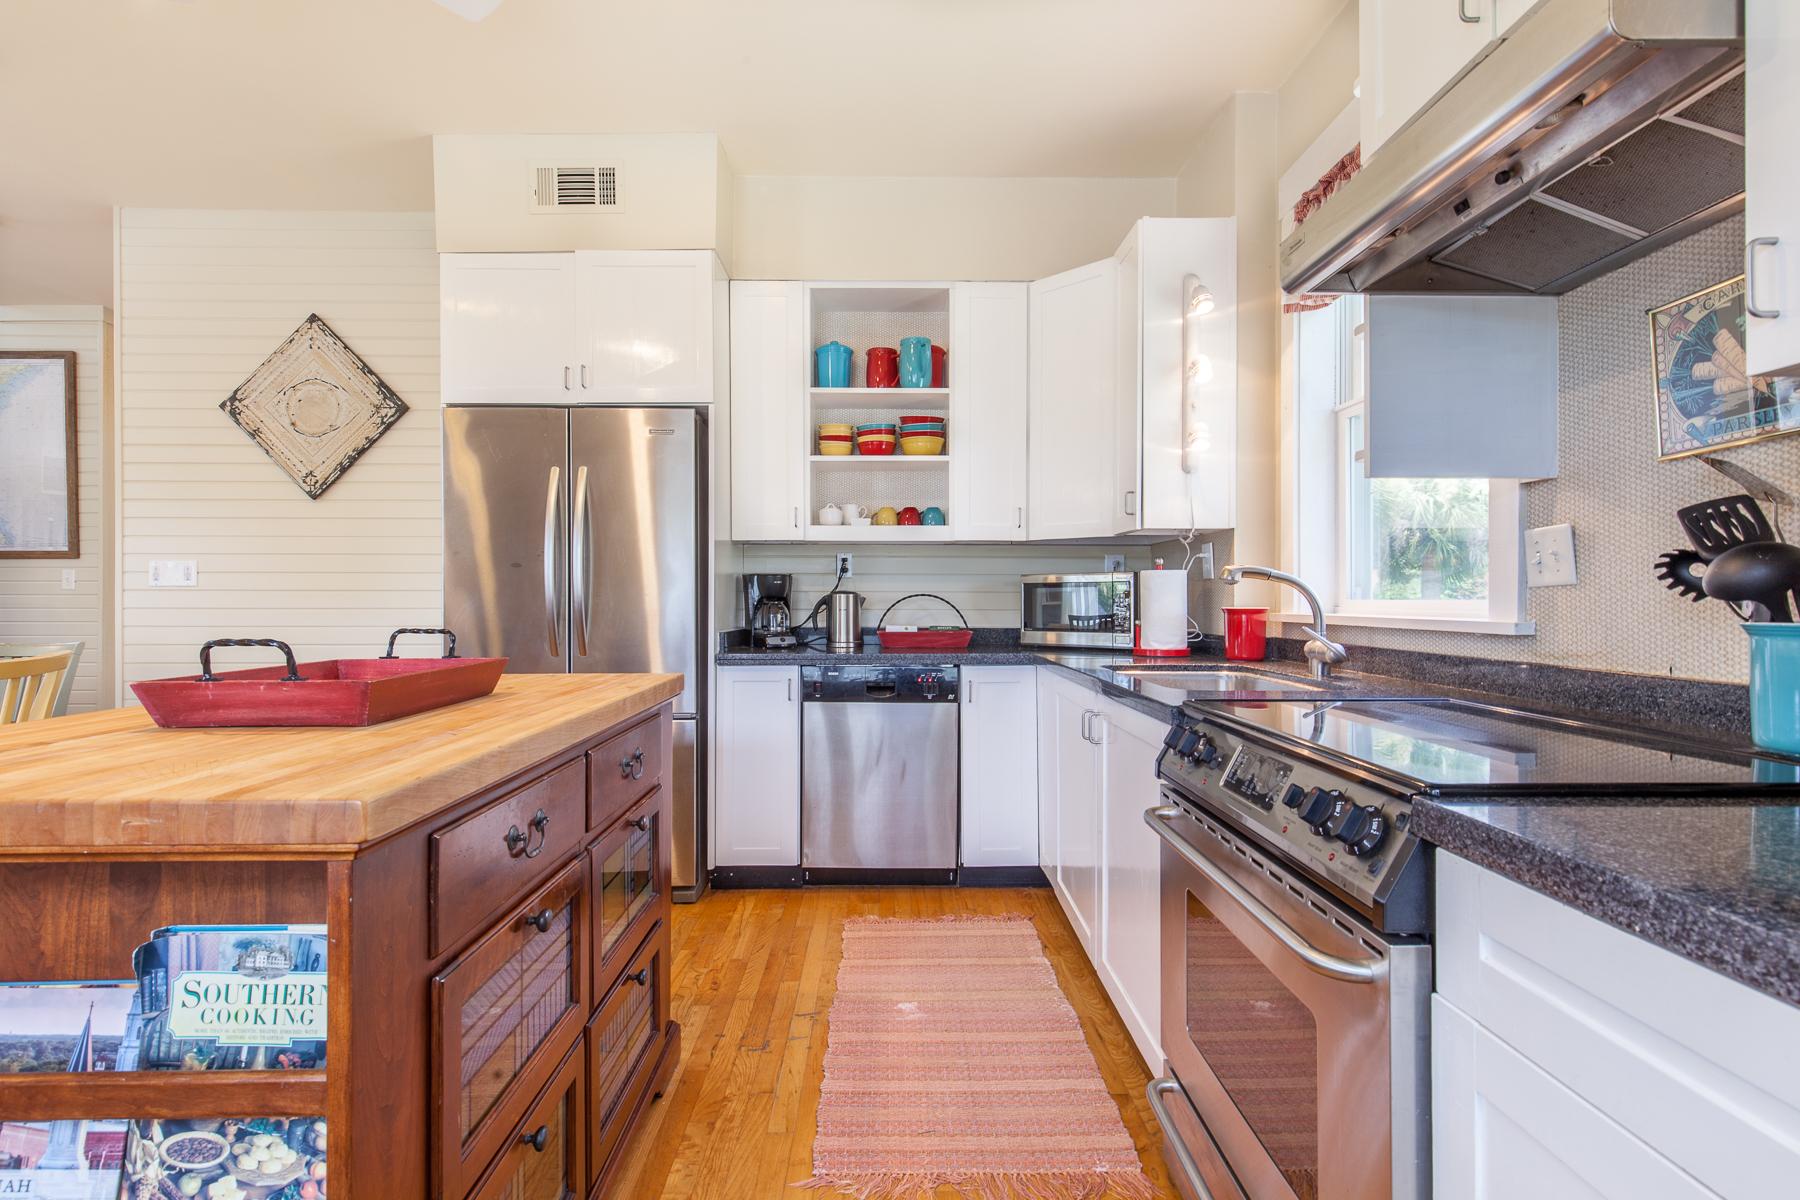 Additional photo for property listing at 1415 Miller Avenue 1415 Miller Avenue Tybee Island, Georgia 31328 Estados Unidos